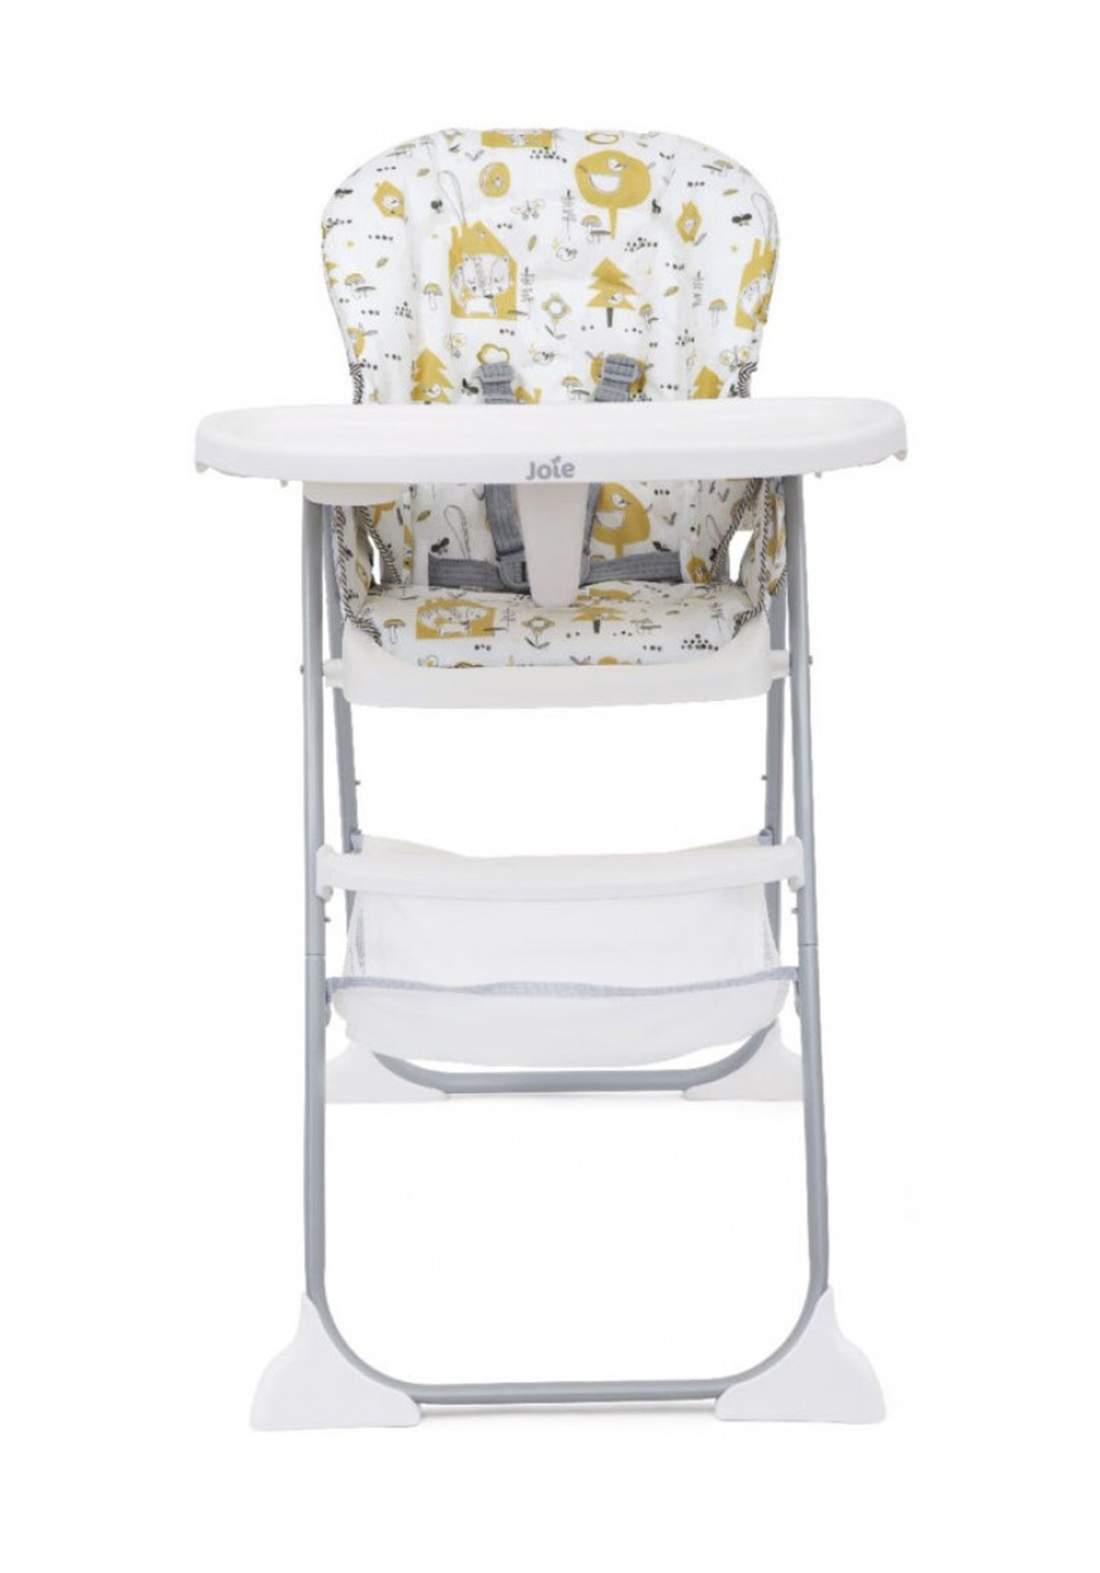 كرسي طعام للاطفال Joie Baby H1127AACOZ000 Mimzy Snacker HighChair - Cozy Space